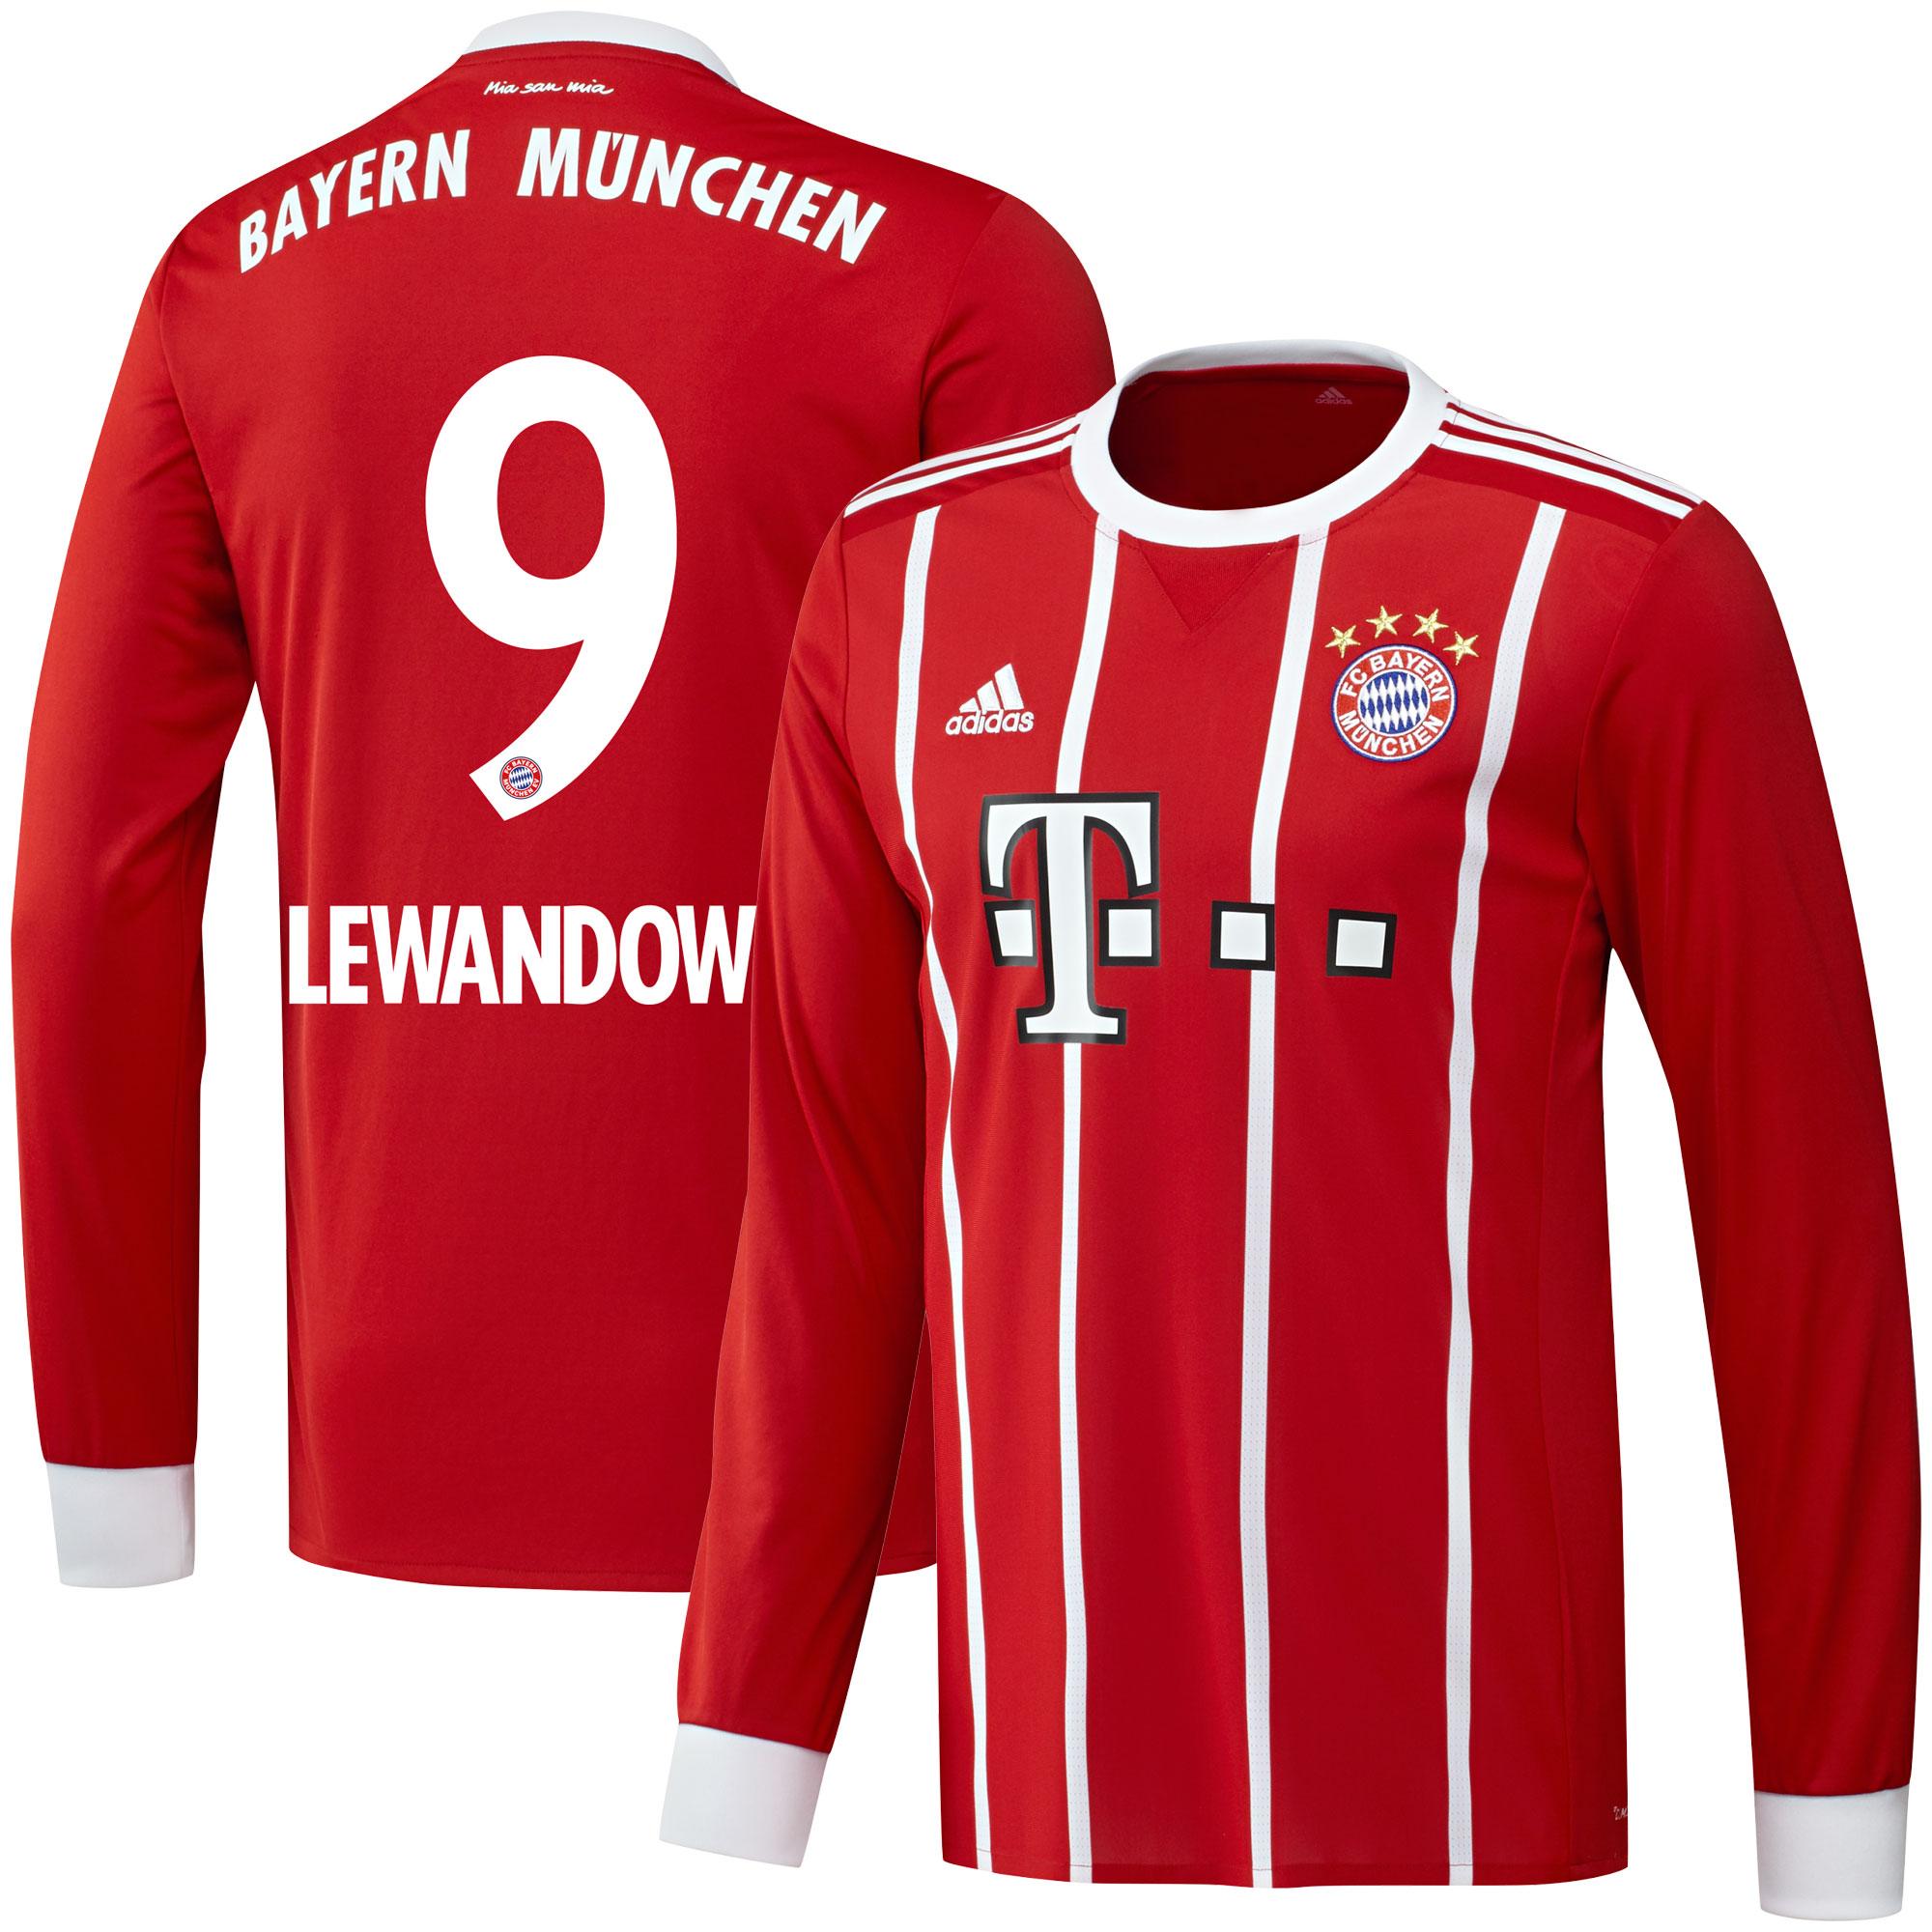 Bayern Munich Home L/S Lewandowski Jersey 2017 / 2018 (Official Printing) - 62